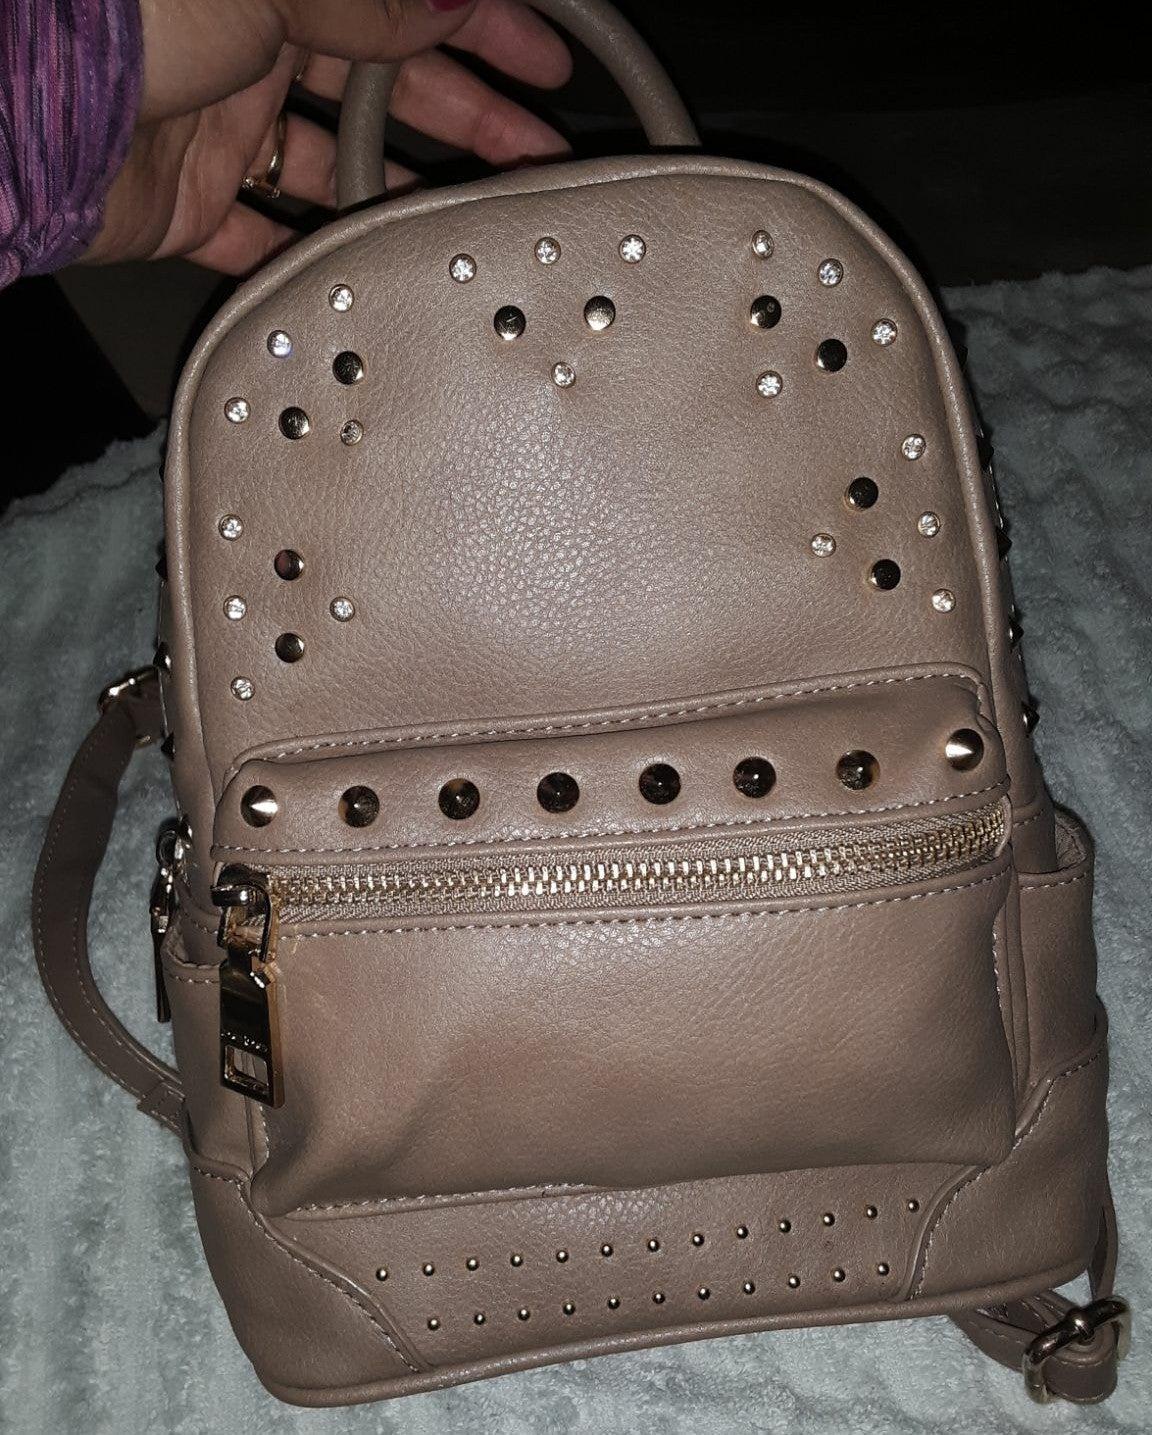 Bebe book bag purse